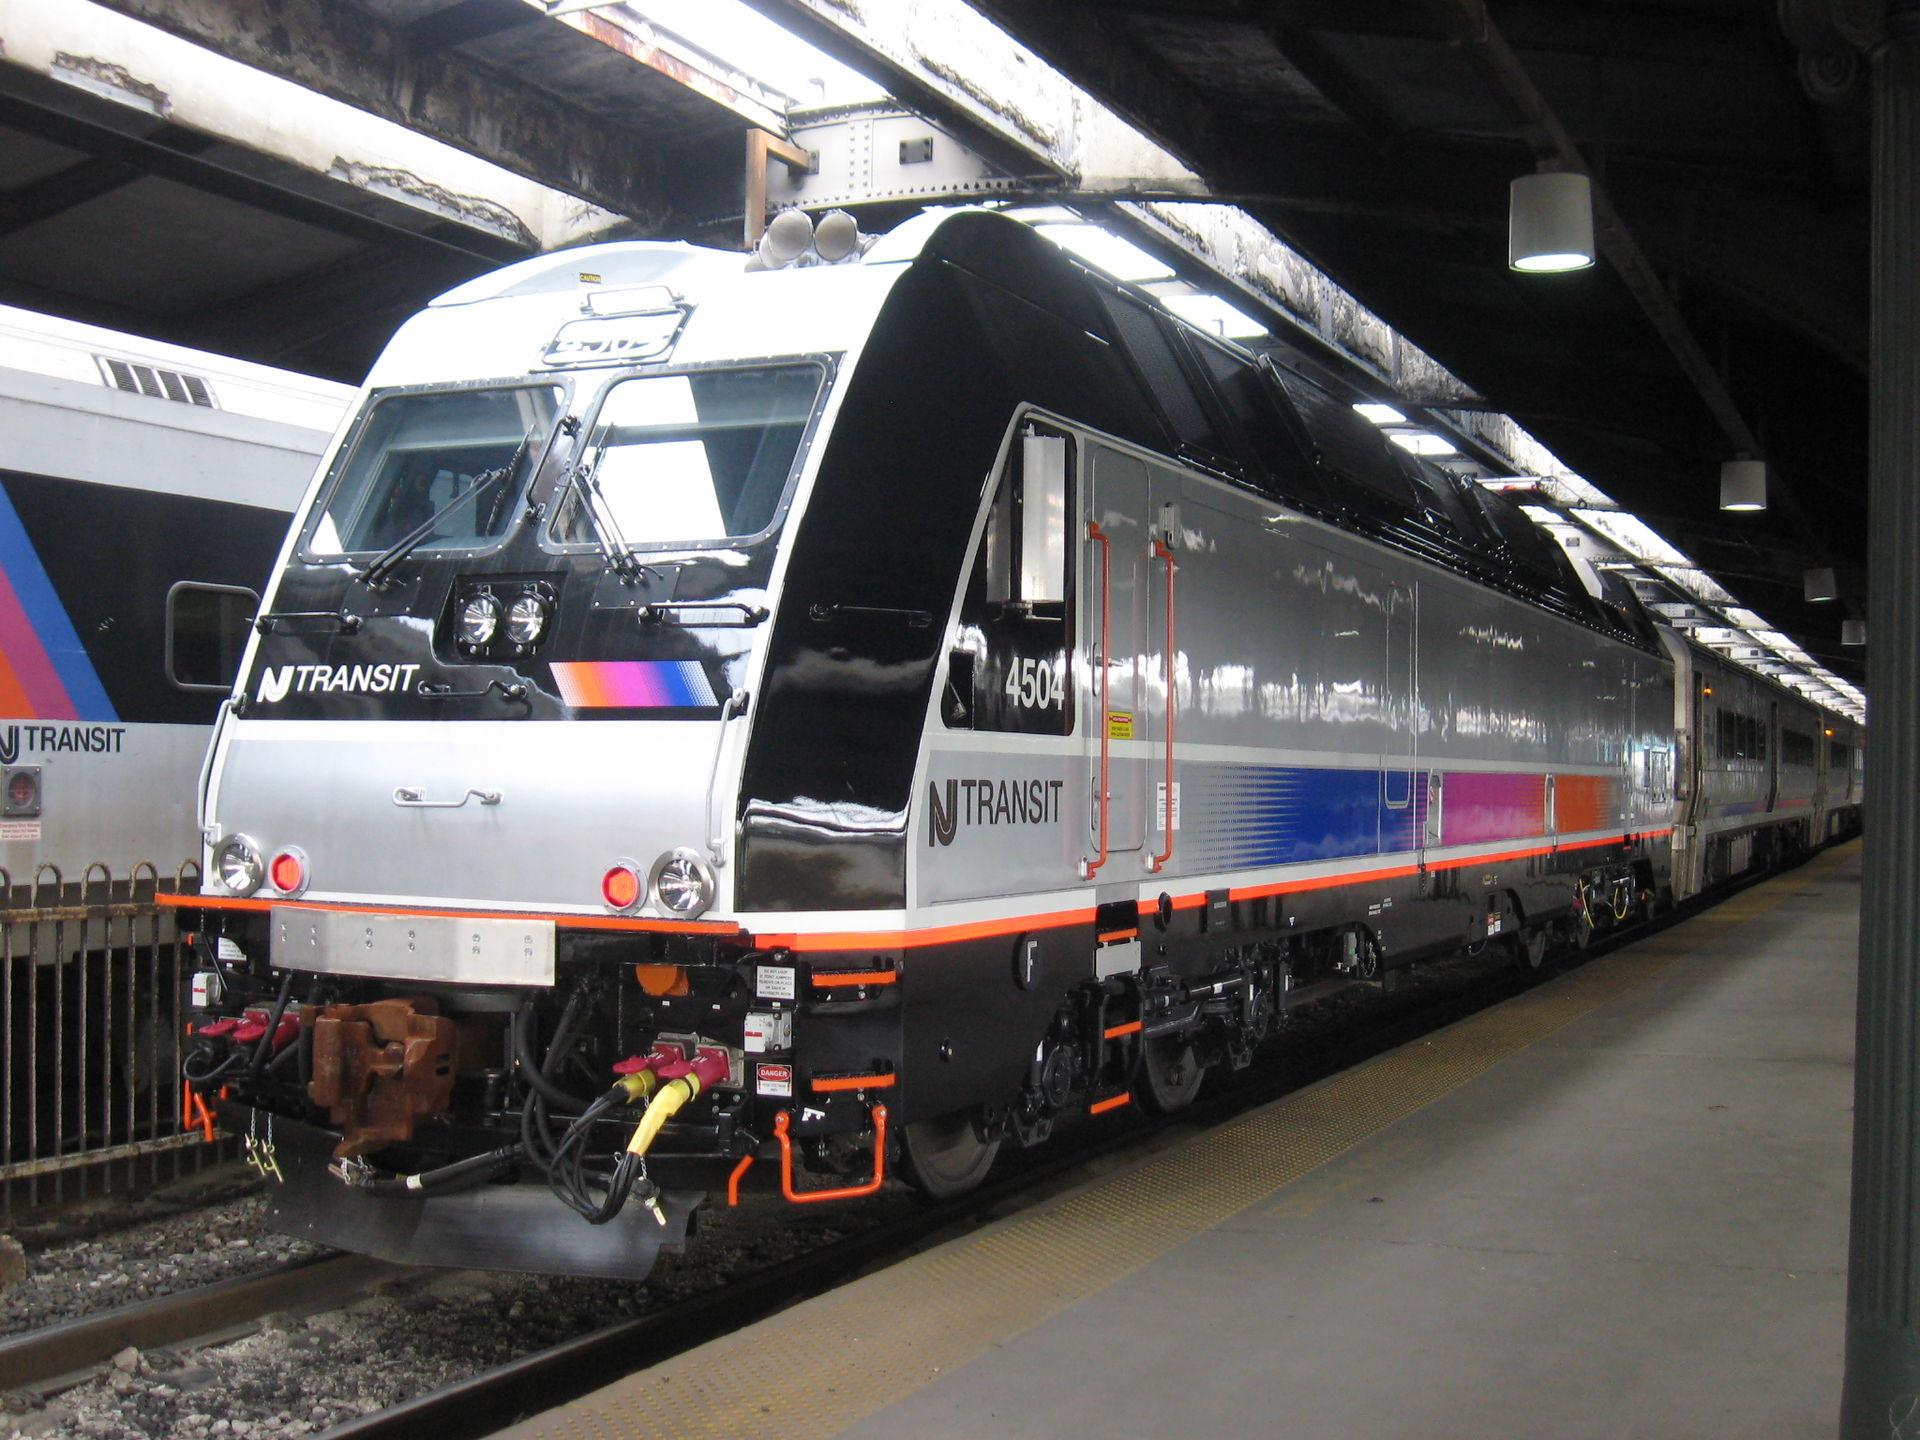 Commuter rail in North America - Wikipedia